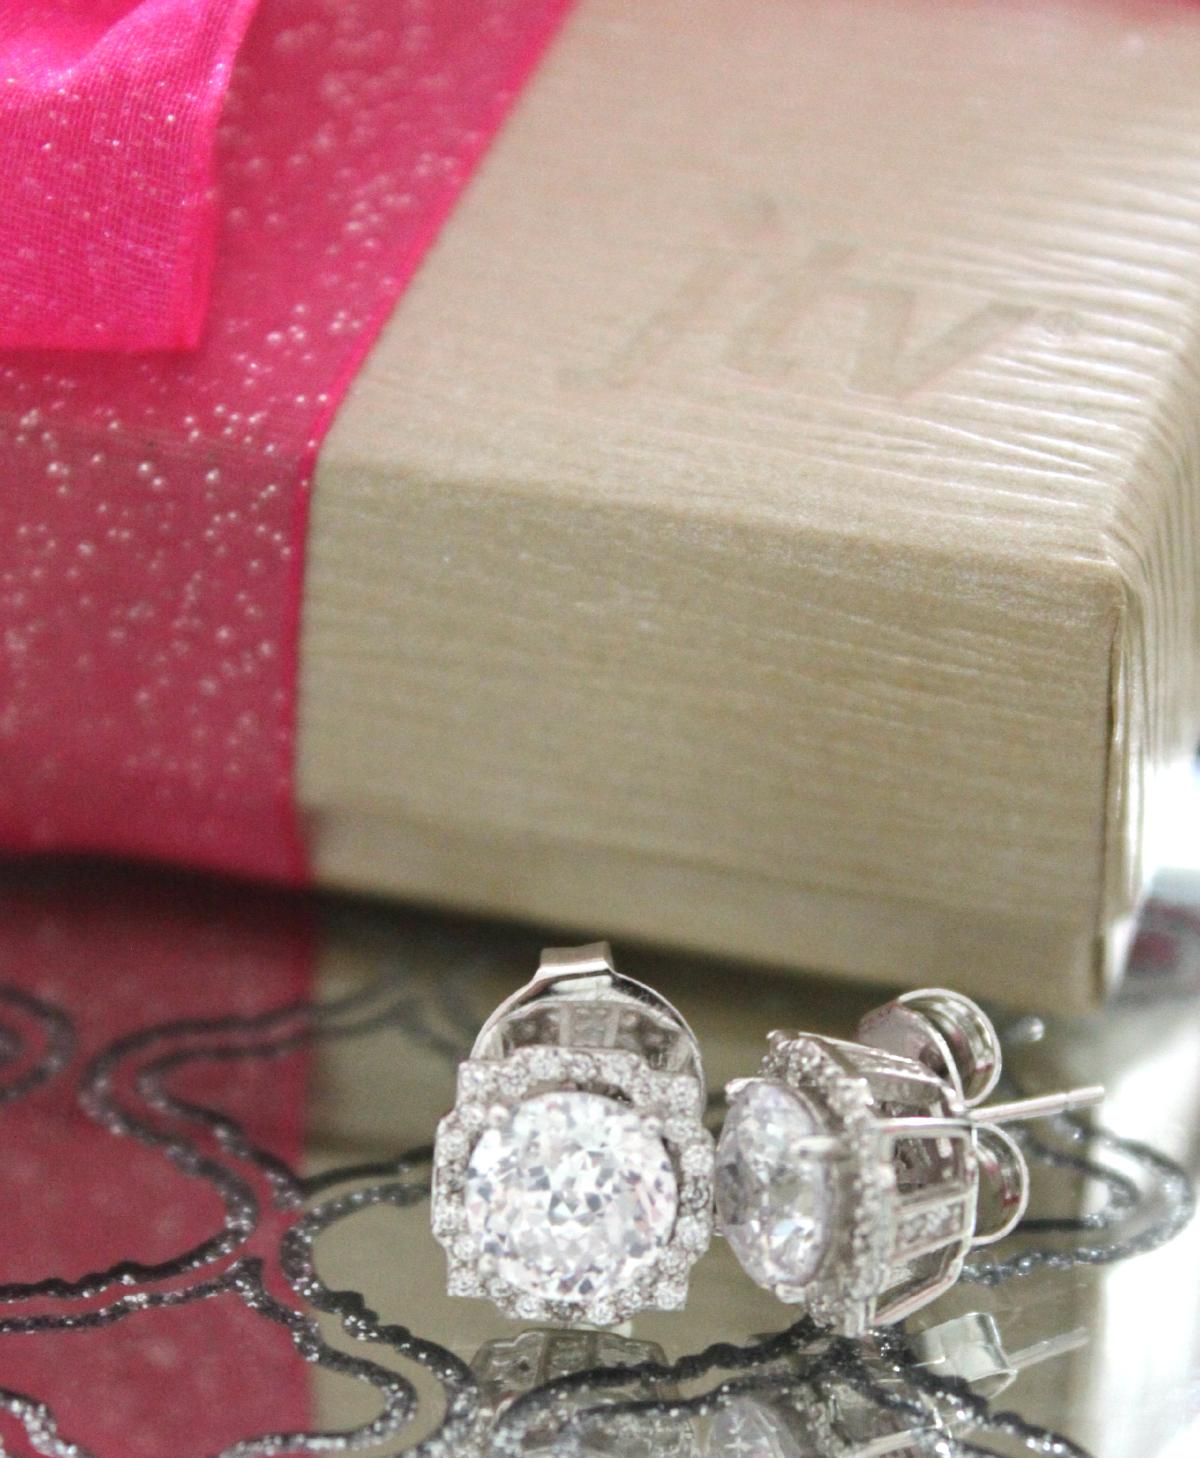 Charles Winston for Bella Luce, JTV Jewelry, JTV, Jewelry Giveaway, Stephanie Ziajka, Diary of a Debutante